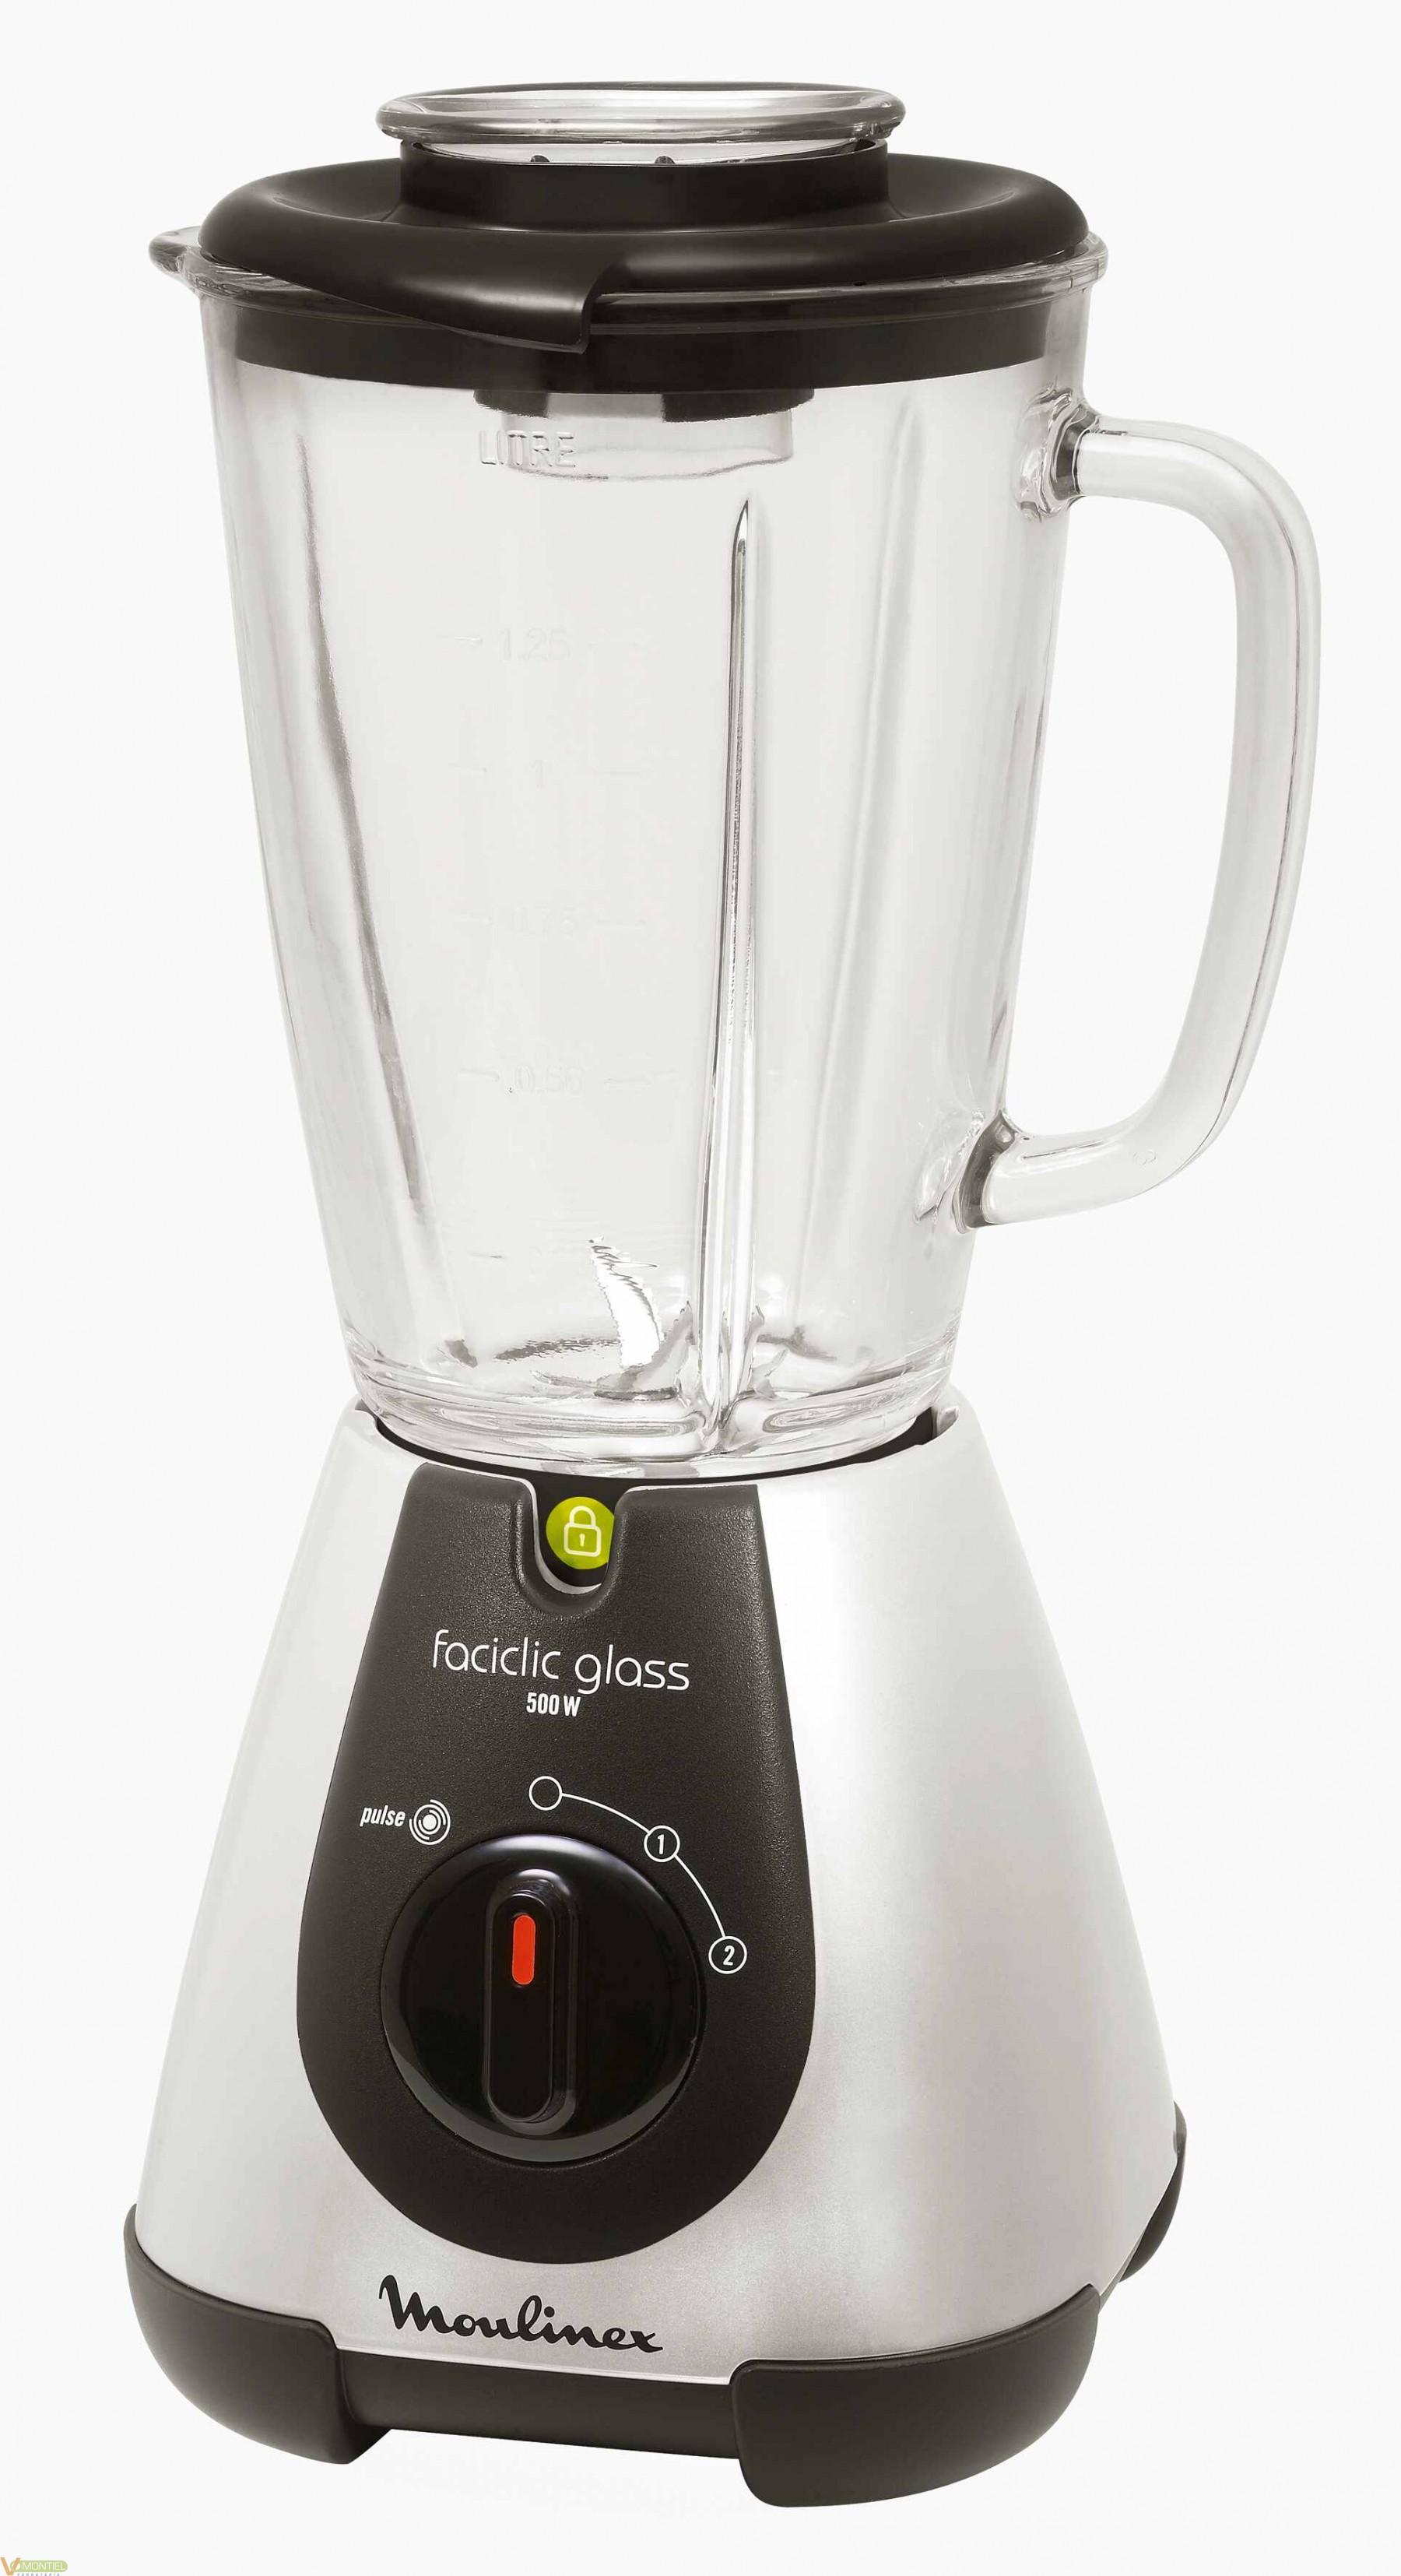 Batidora vaso 500w facilclic-0